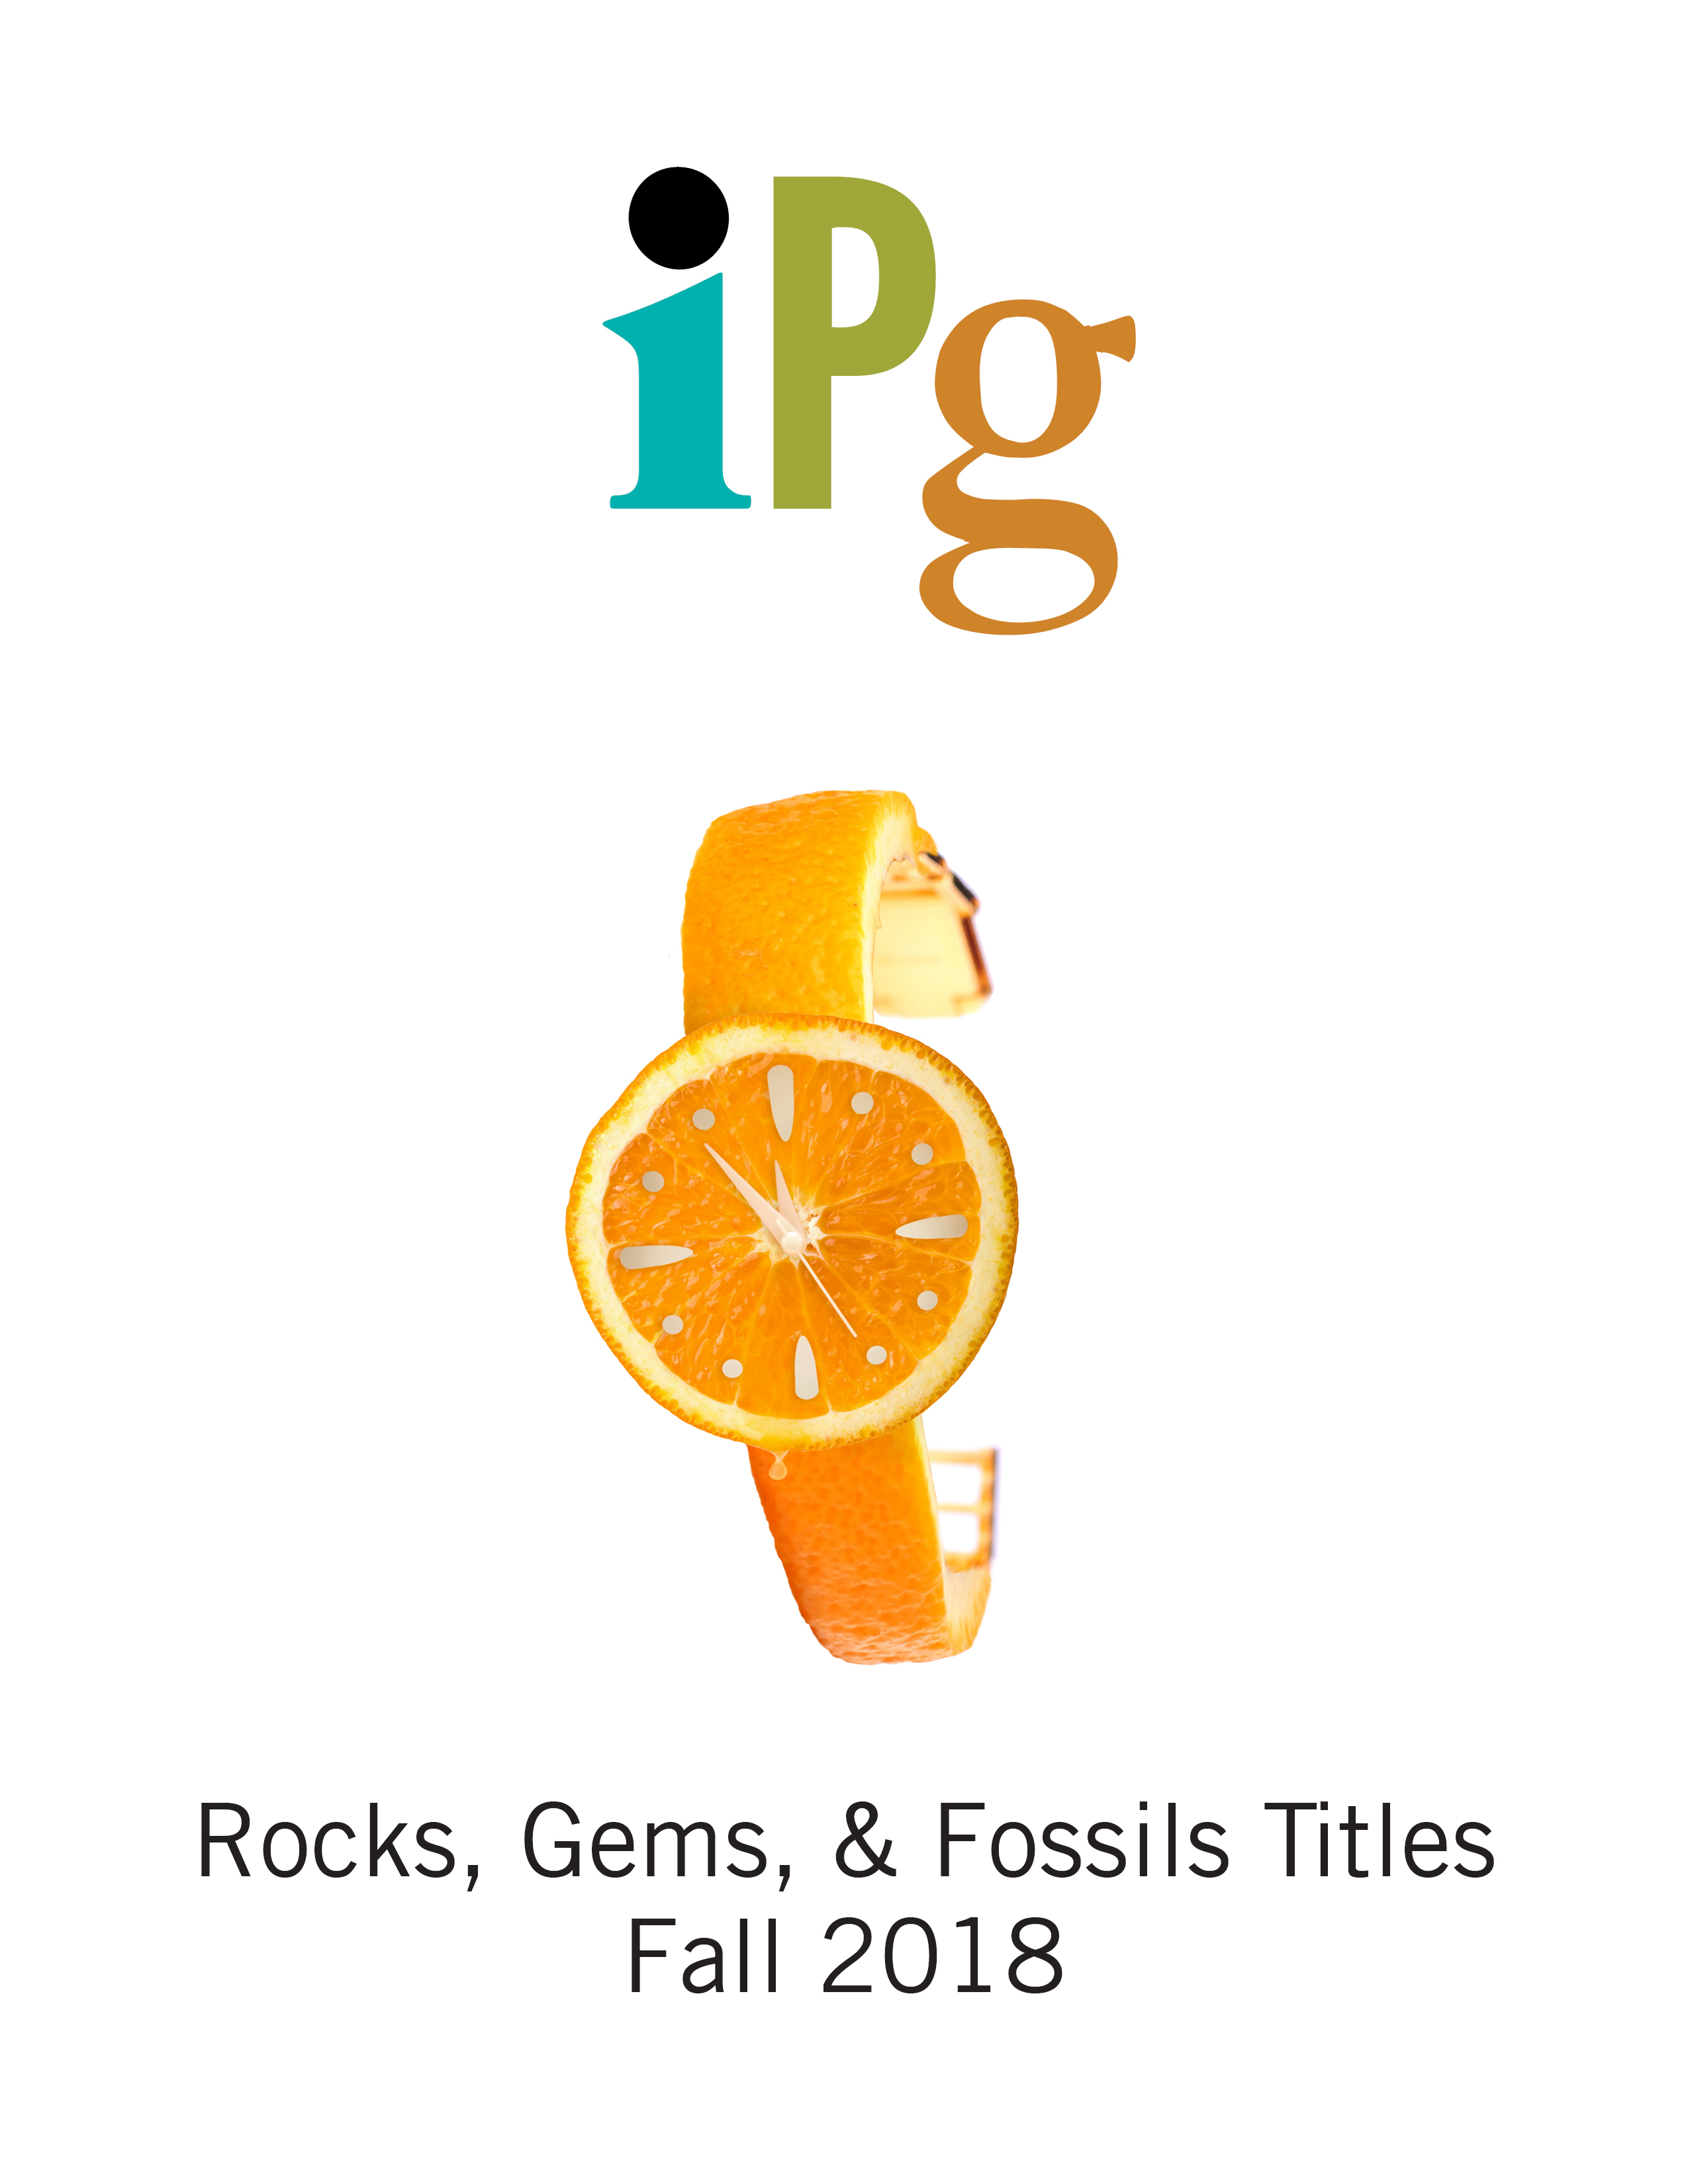 Rocks, Gems & Fossils Titles